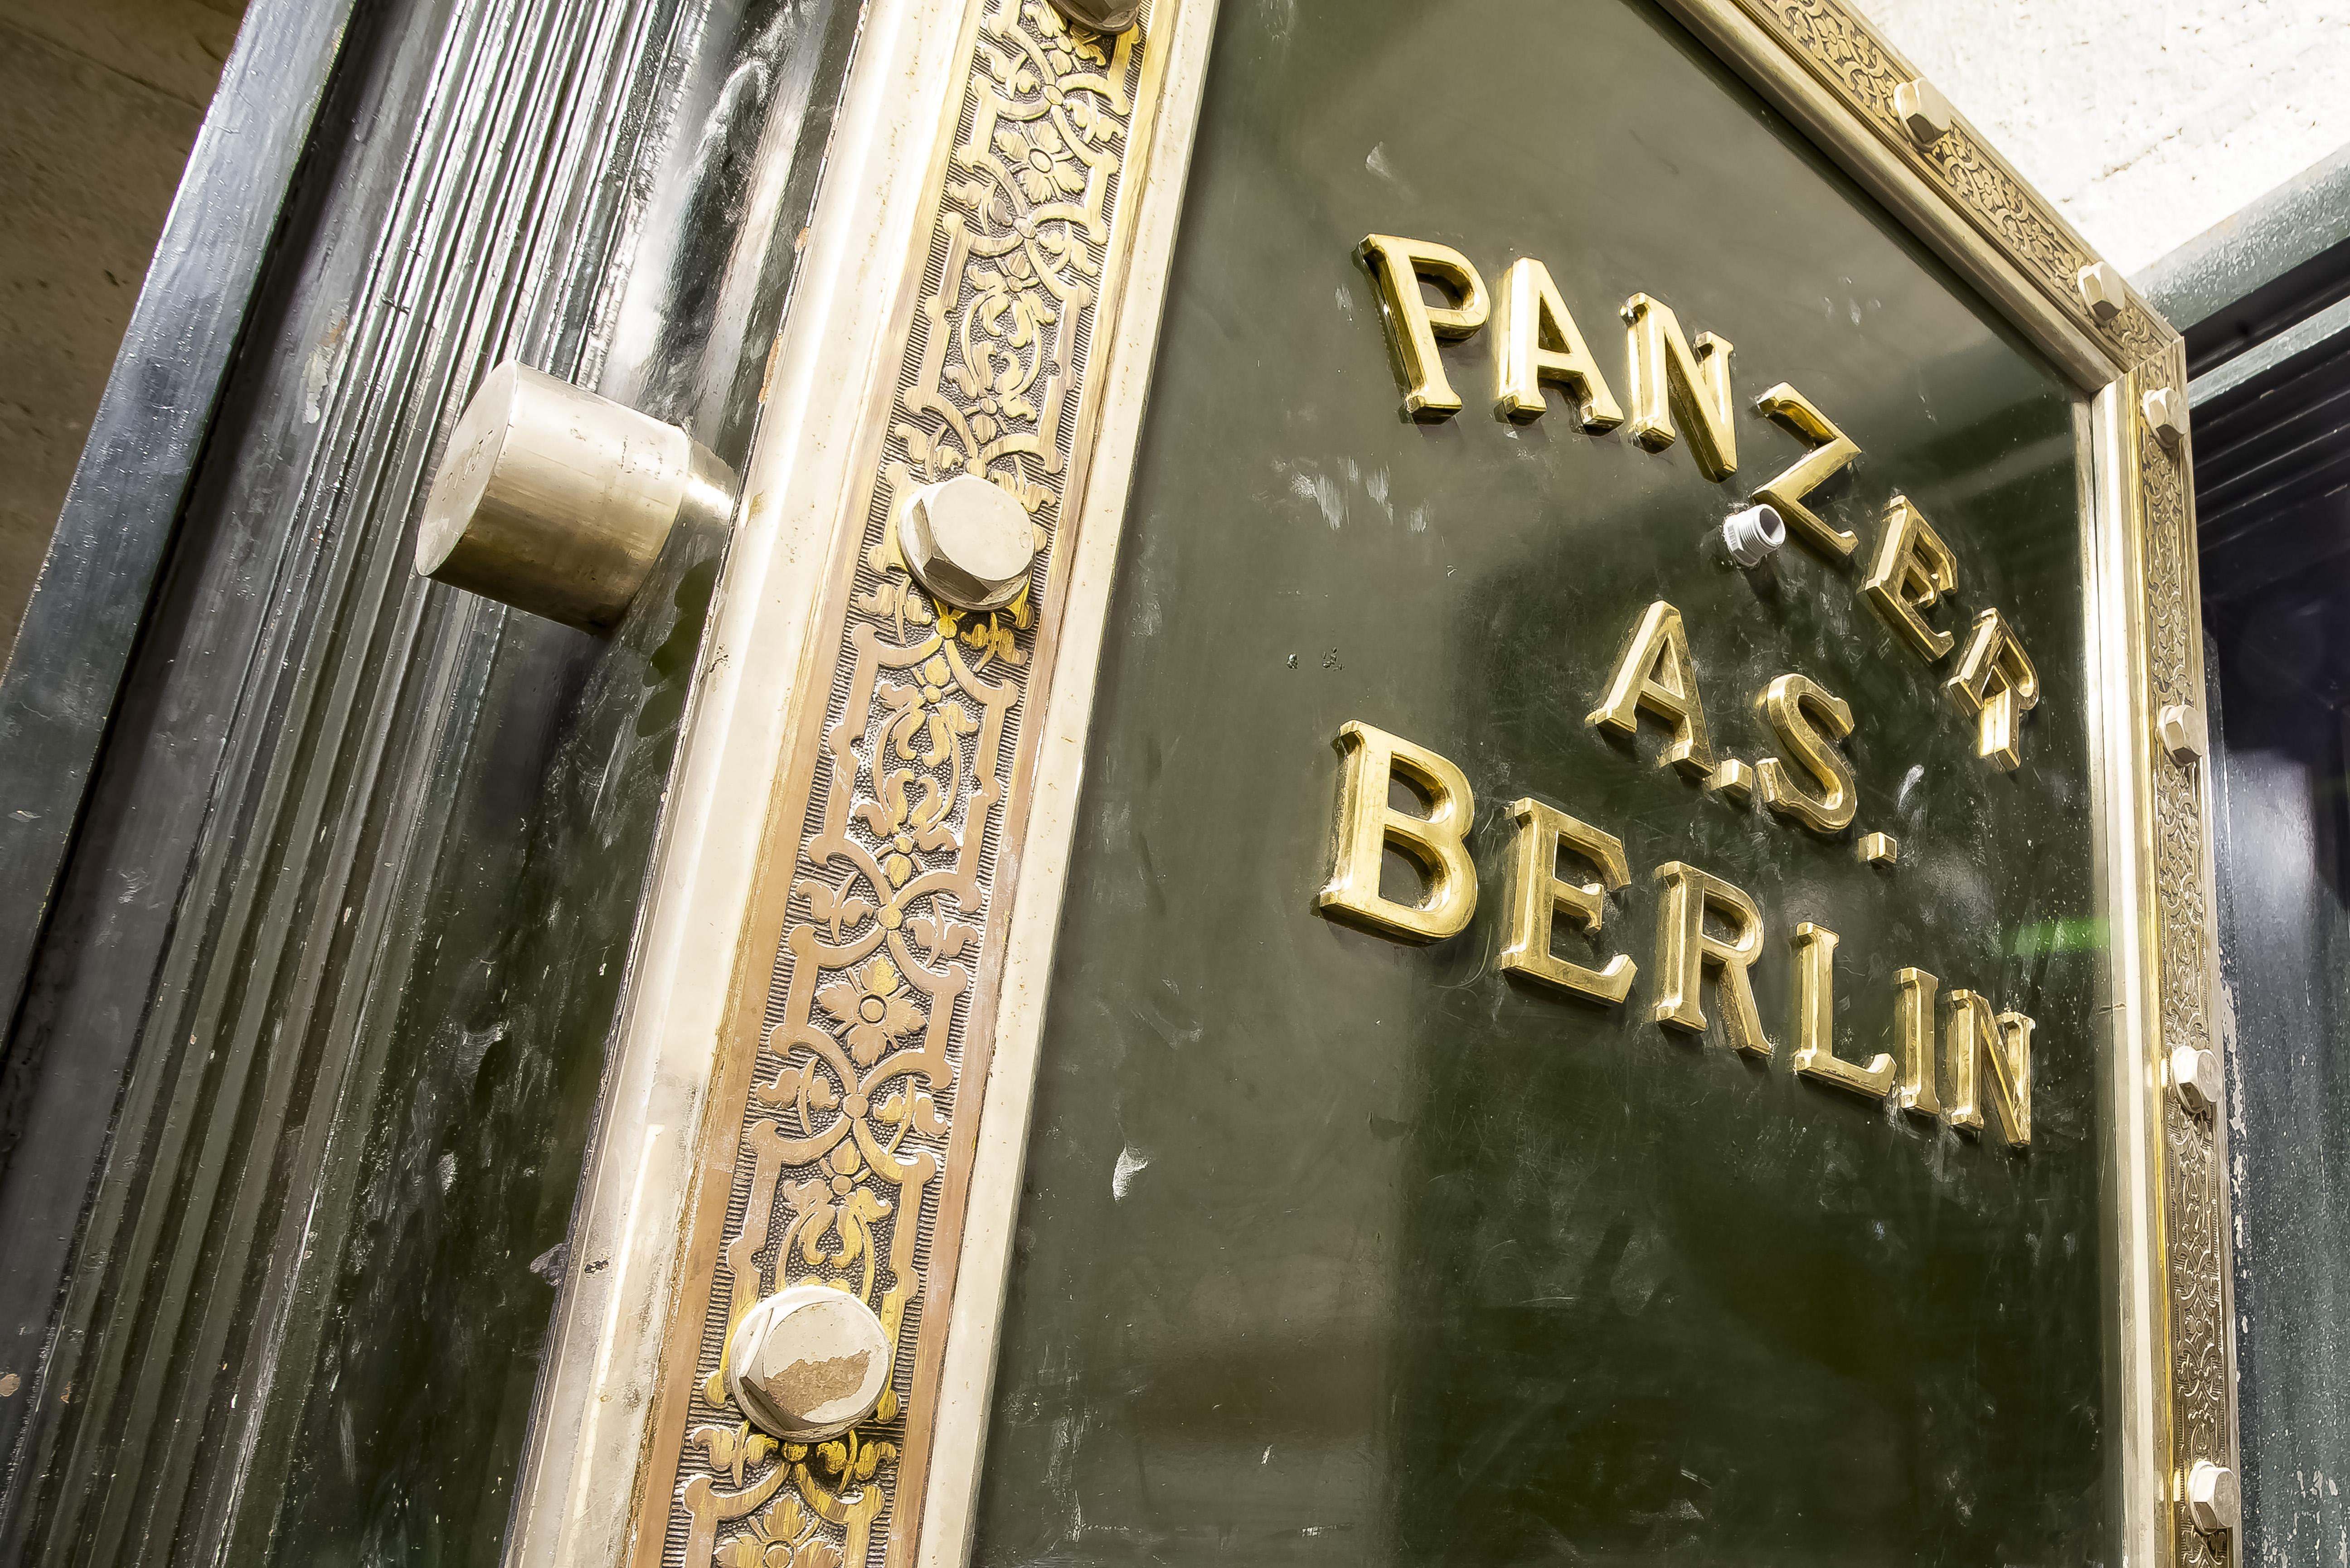 Panser A.S. Berlin (Danmark)